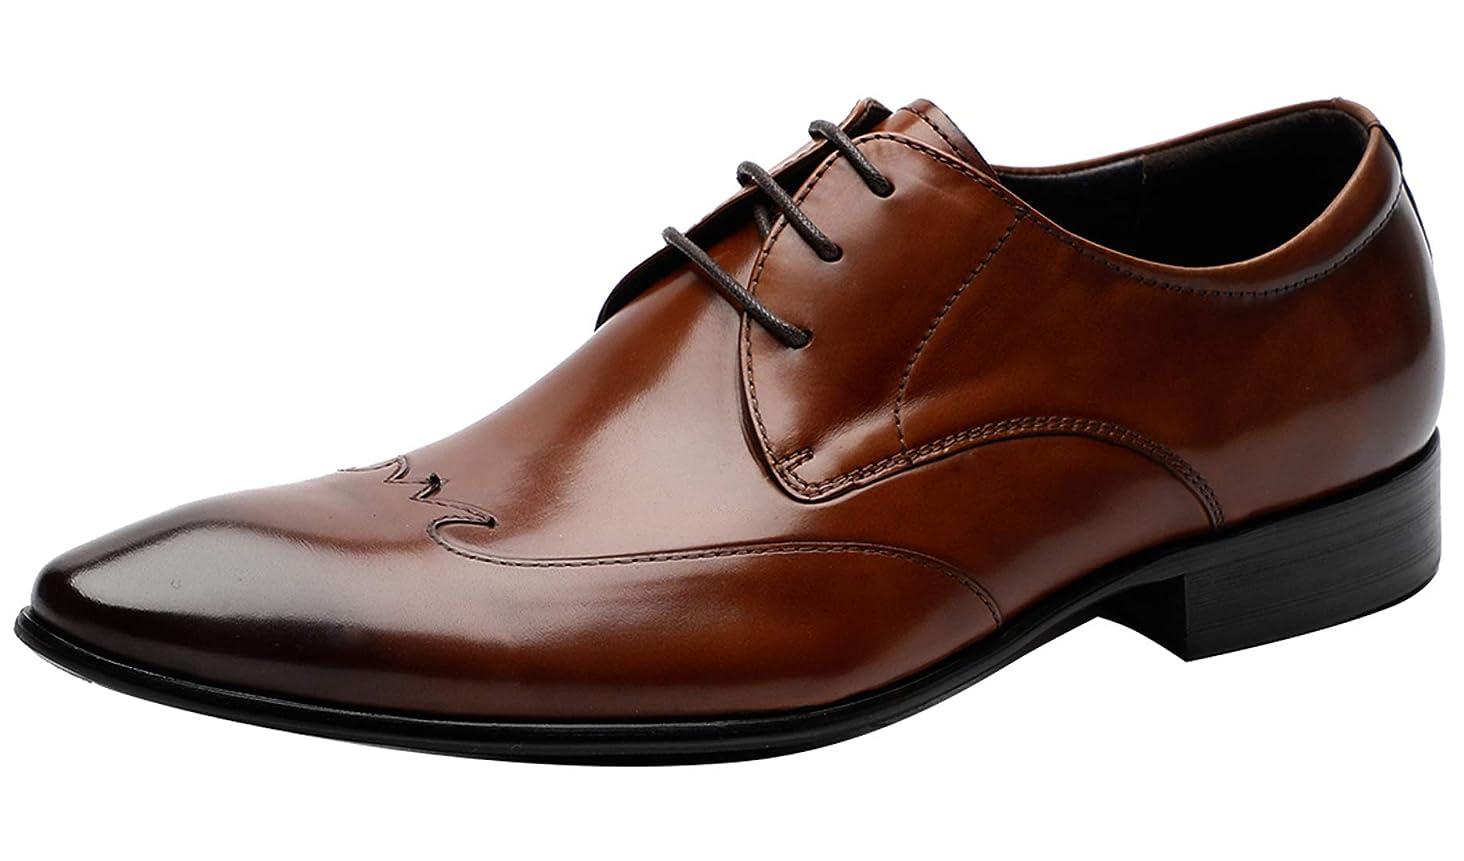 Mens Dress Shoes Formal Oxfords Formal Leather Brogue Derby Shoes - Men Wedding Shoes